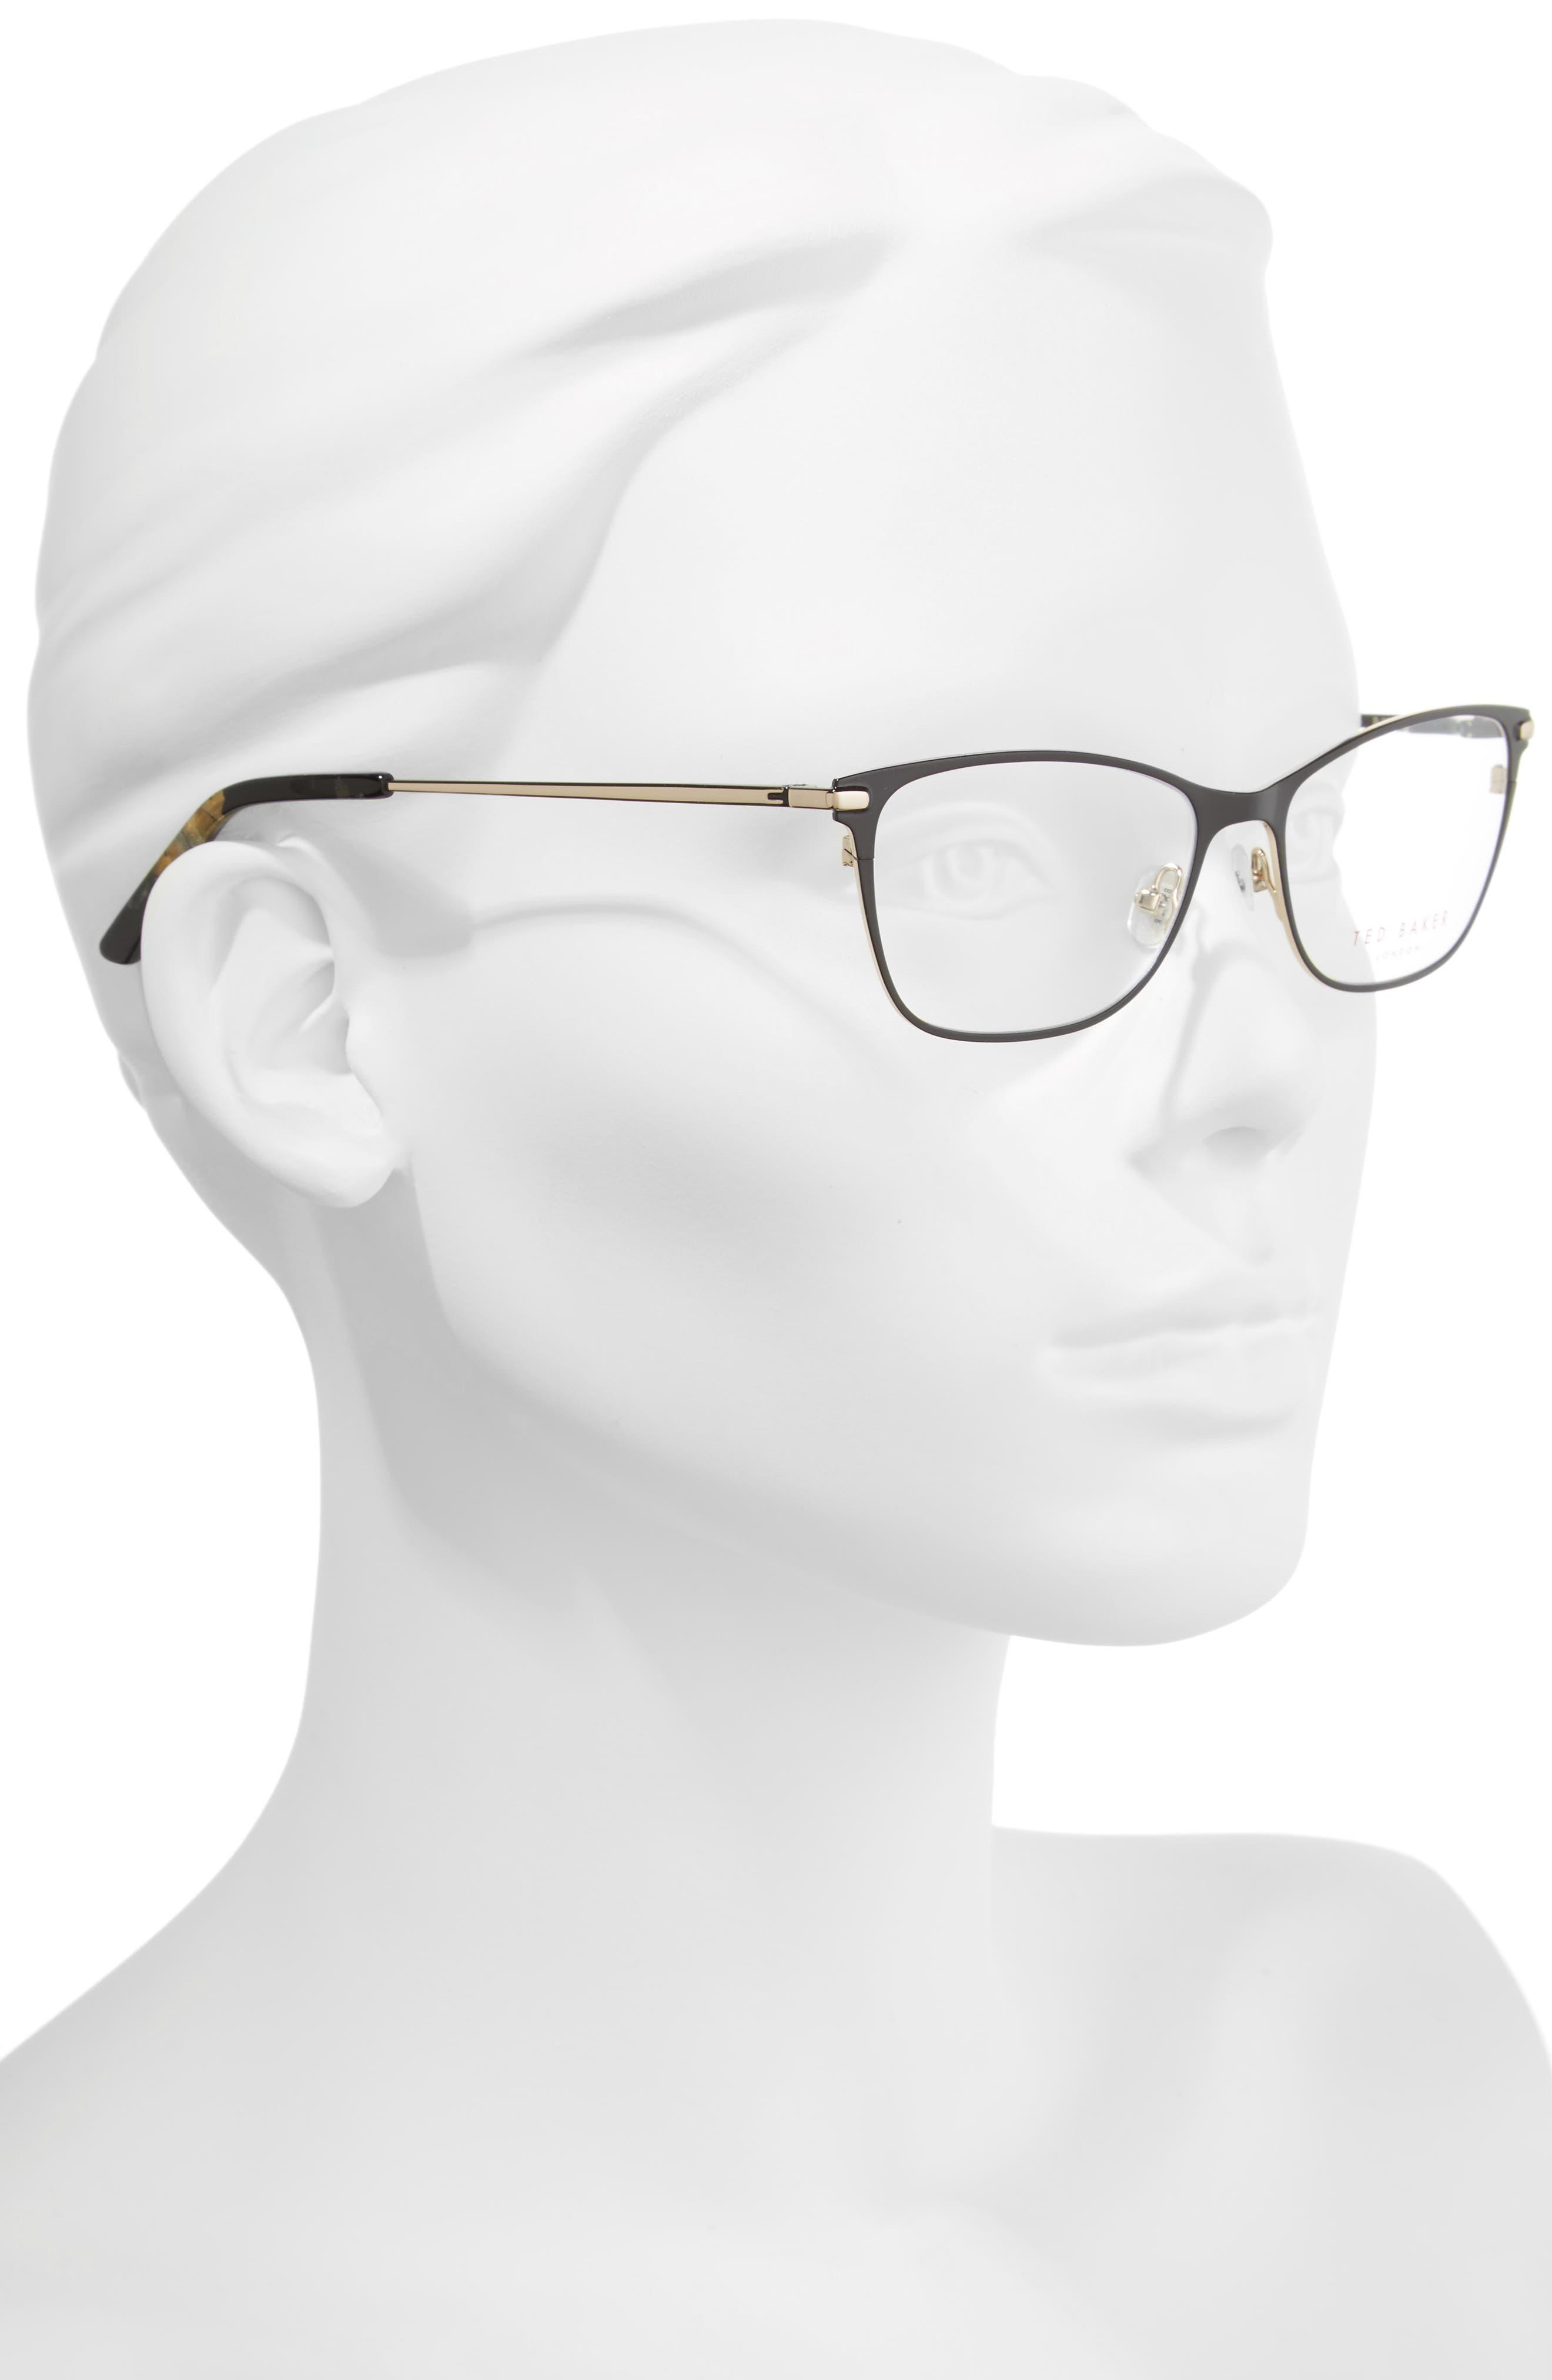 51mm Metal Cat Eye Optical Glasses,                             Alternate thumbnail 2, color,                             001